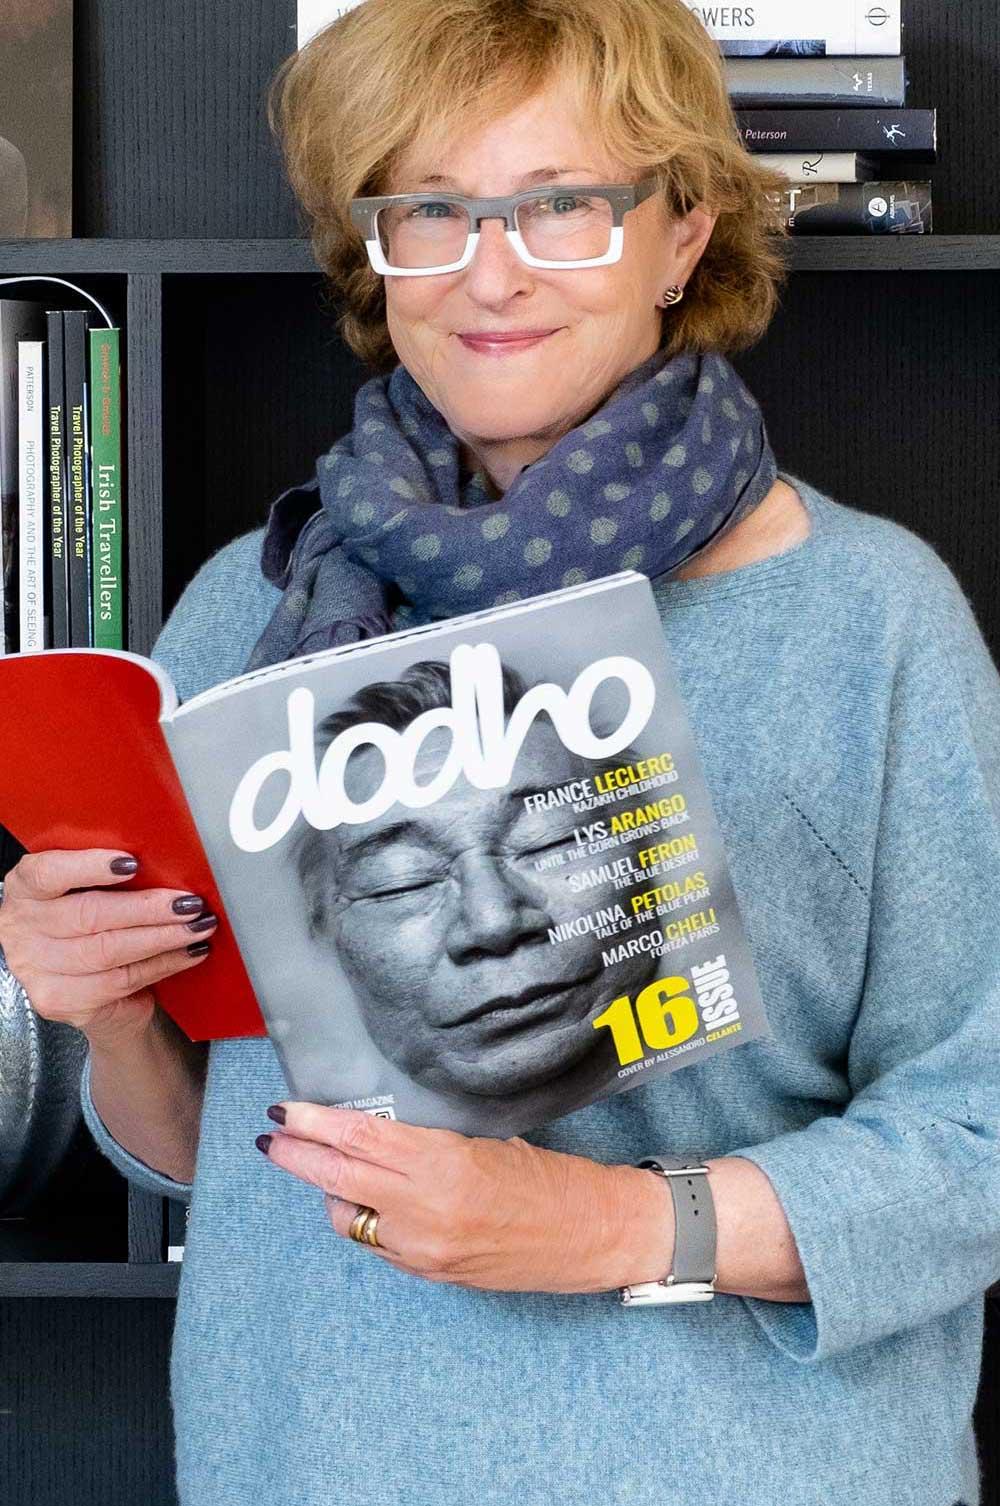 https://www.dodho.com/wp-content/uploads/2021/06/France.jpg